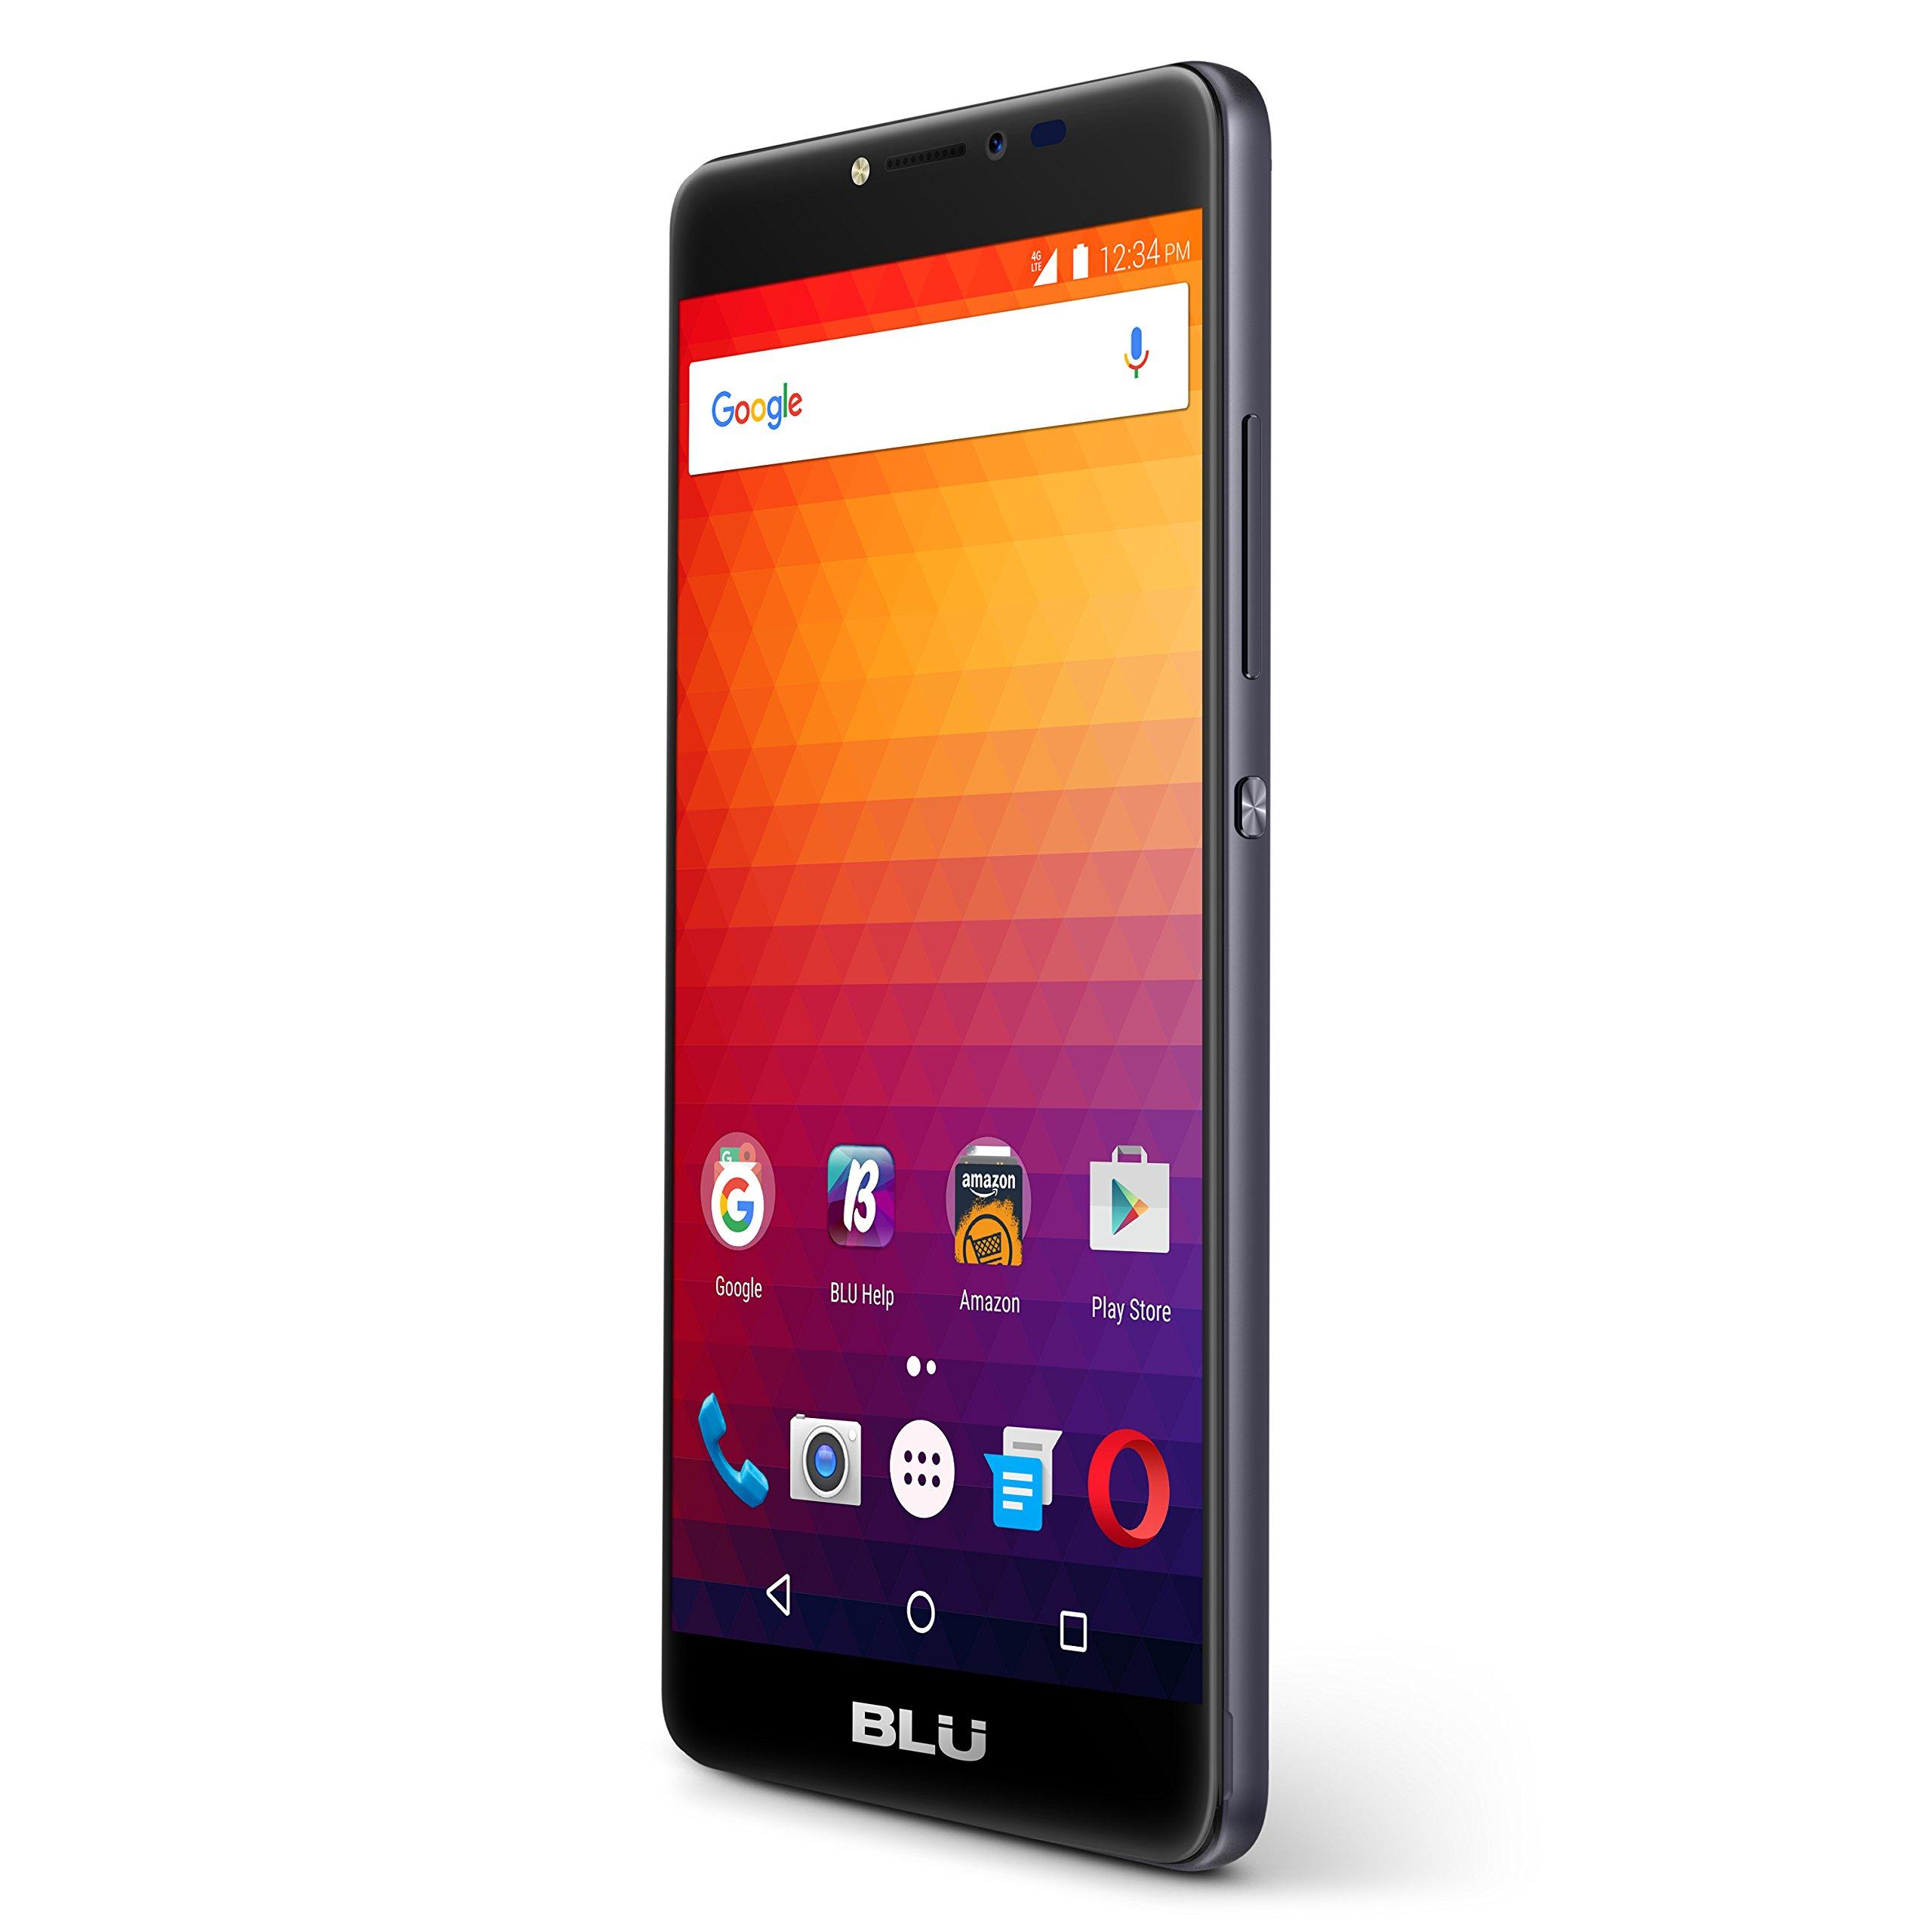 BLU R1 Plus - 4G LTE Unlocked Smartphone - 32GB + 3GB RAM -Black by BLU